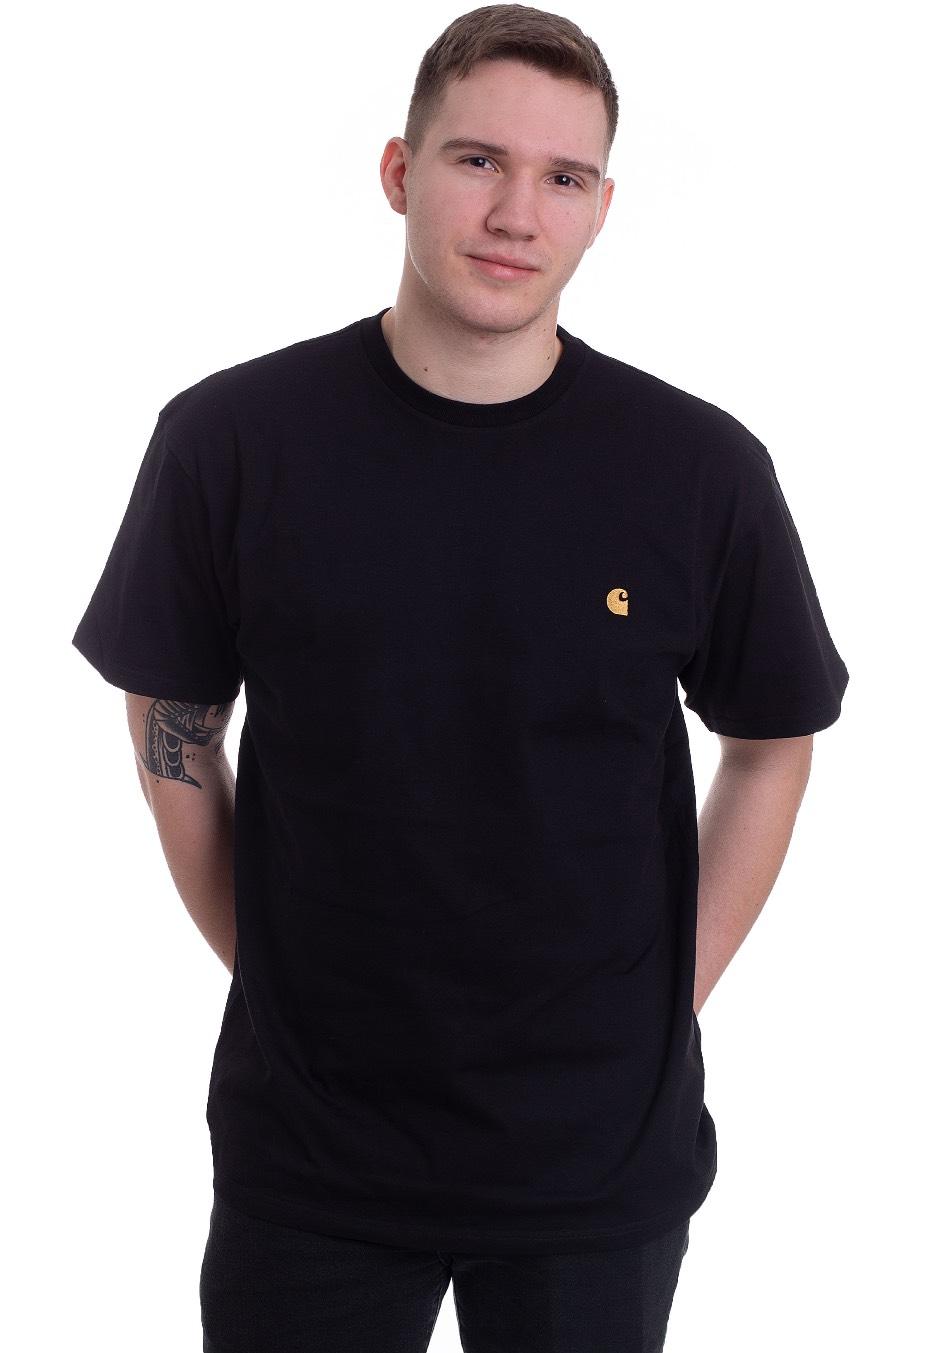 Carhartt T-Shirt Black